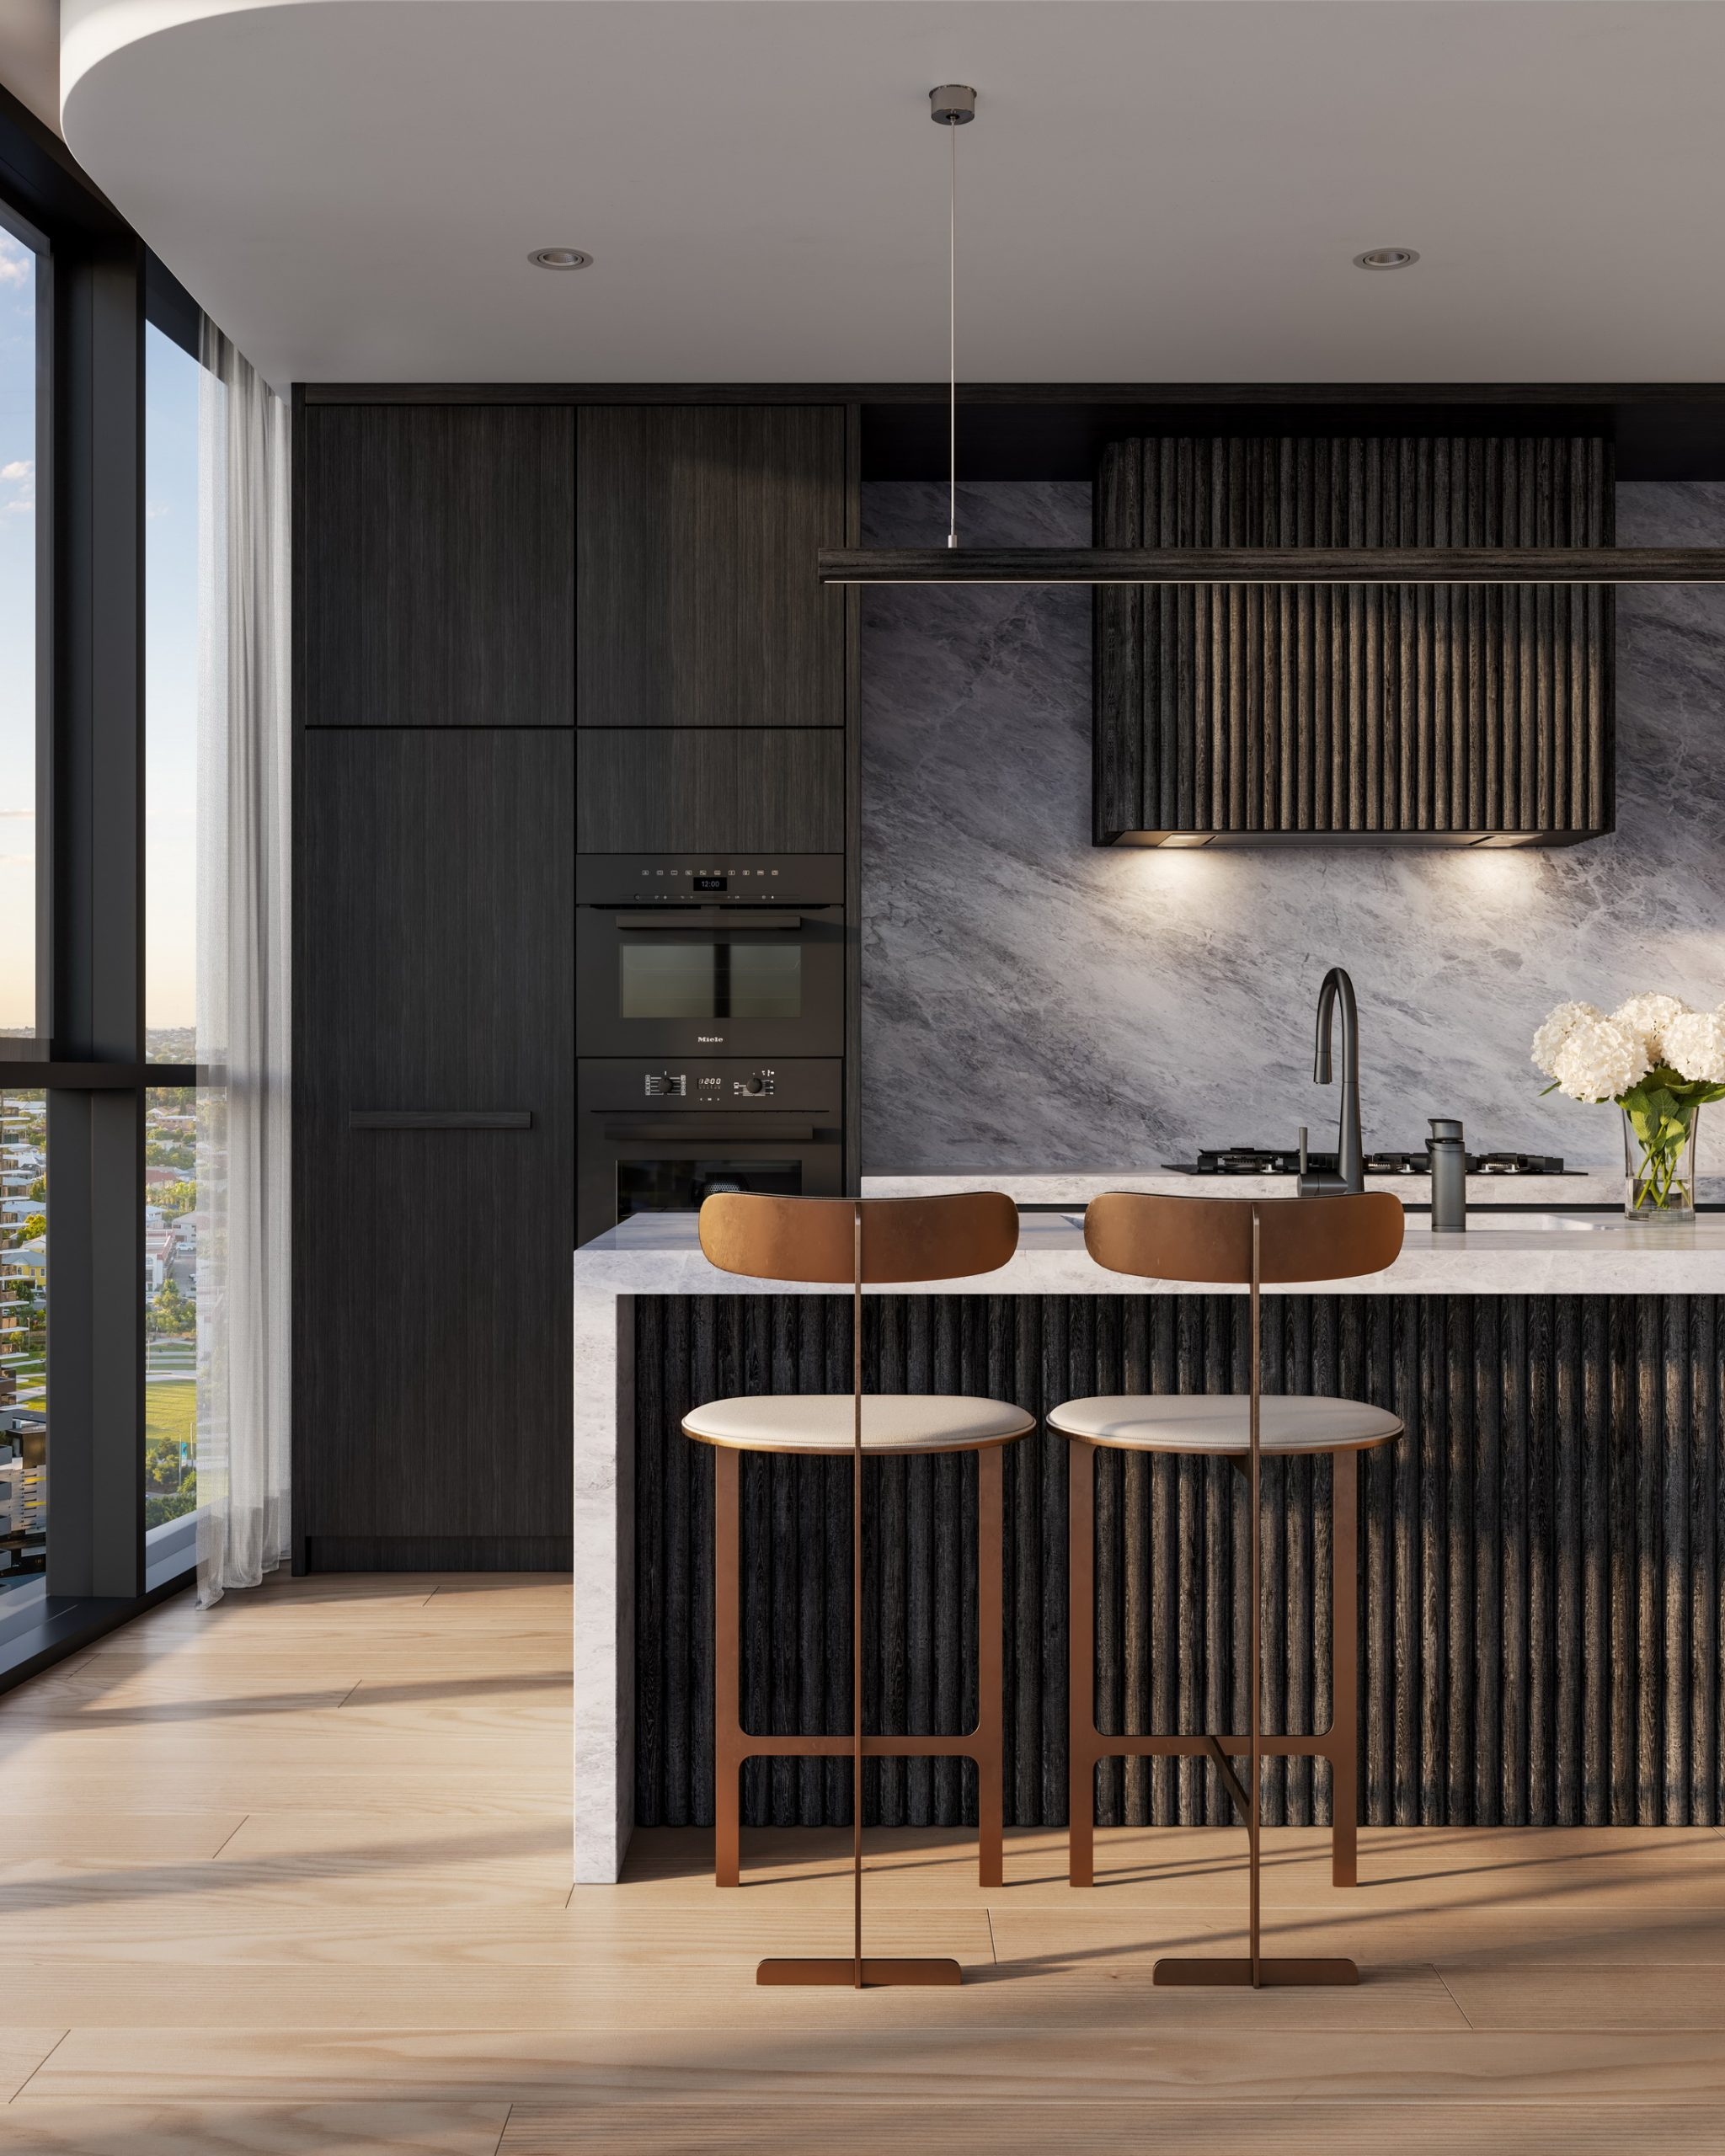 Rivello-queensland-render-3d-fkd-studio-architecture-luxury-interior-design-kitchen-colour